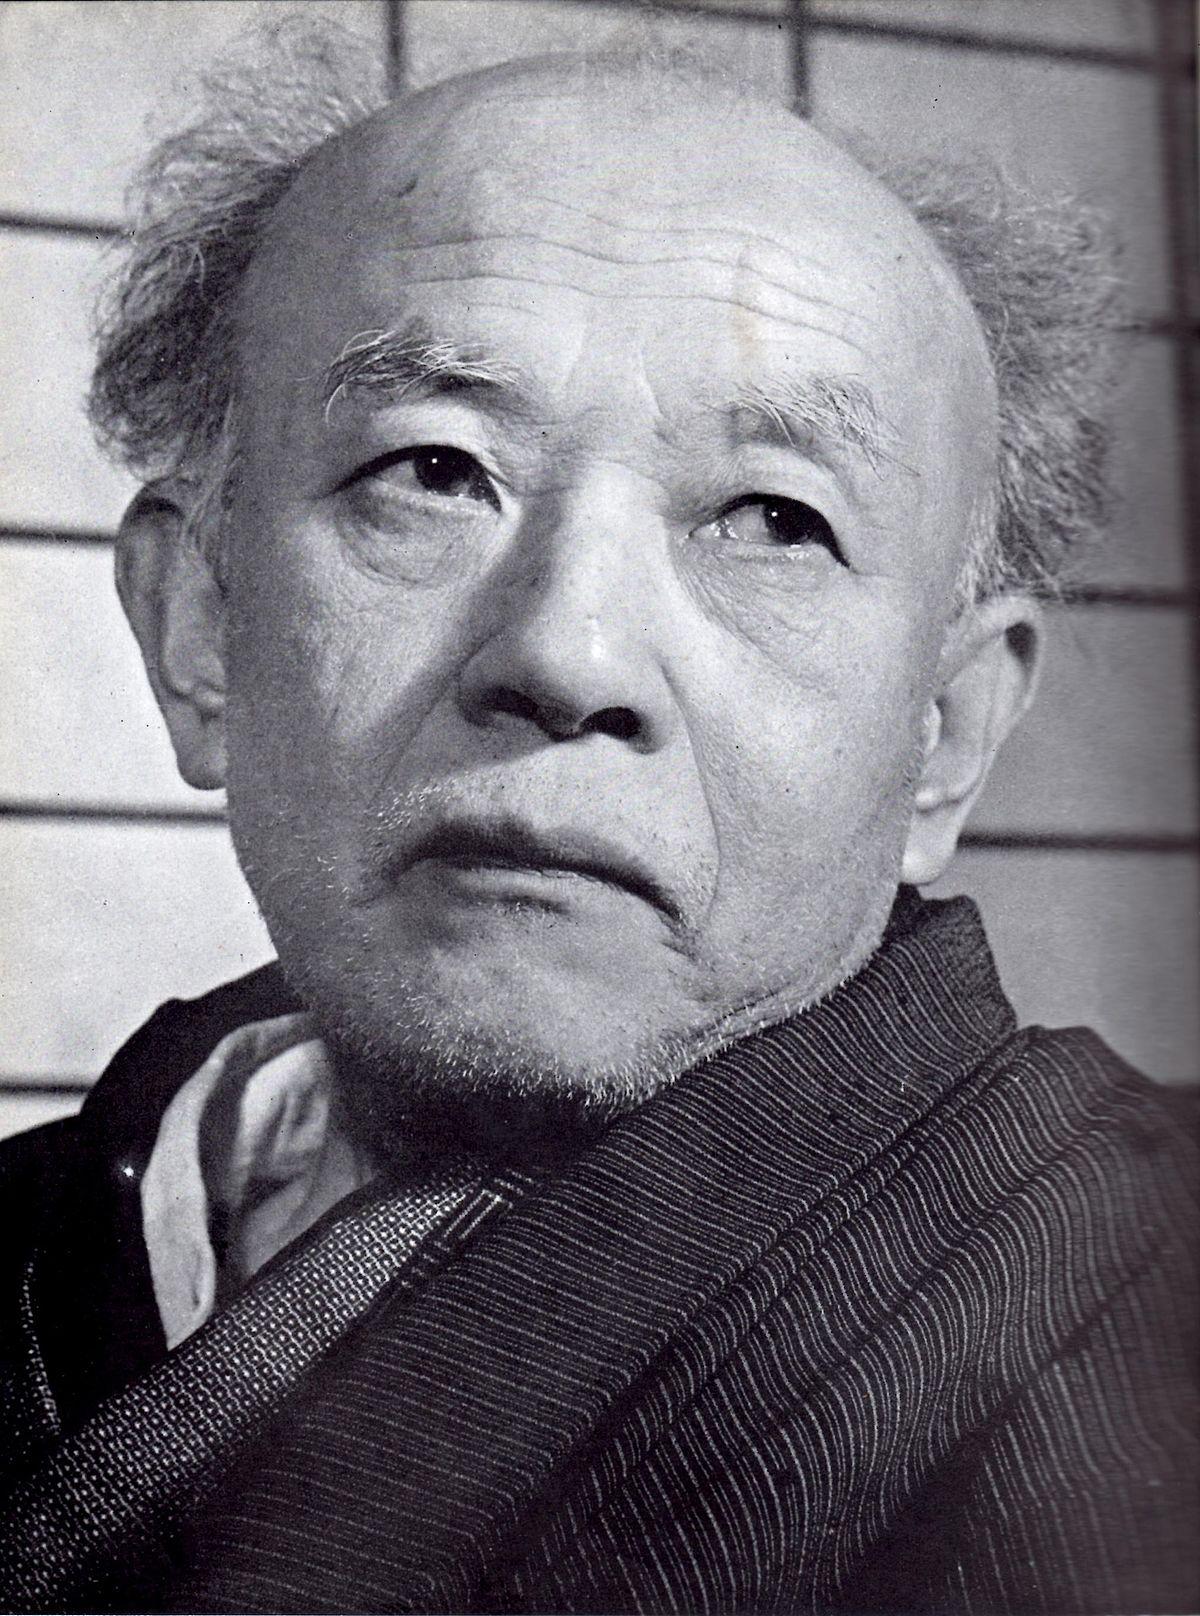 https://upload.wikimedia.org/wikipedia/commons/thumb/b/bd/Kobayashi_Kokei_photographed_by_Shigeru_Tamura.jpg/1200px-Kobayashi_Kokei_photographed_by_Shigeru_Tamura.jpg